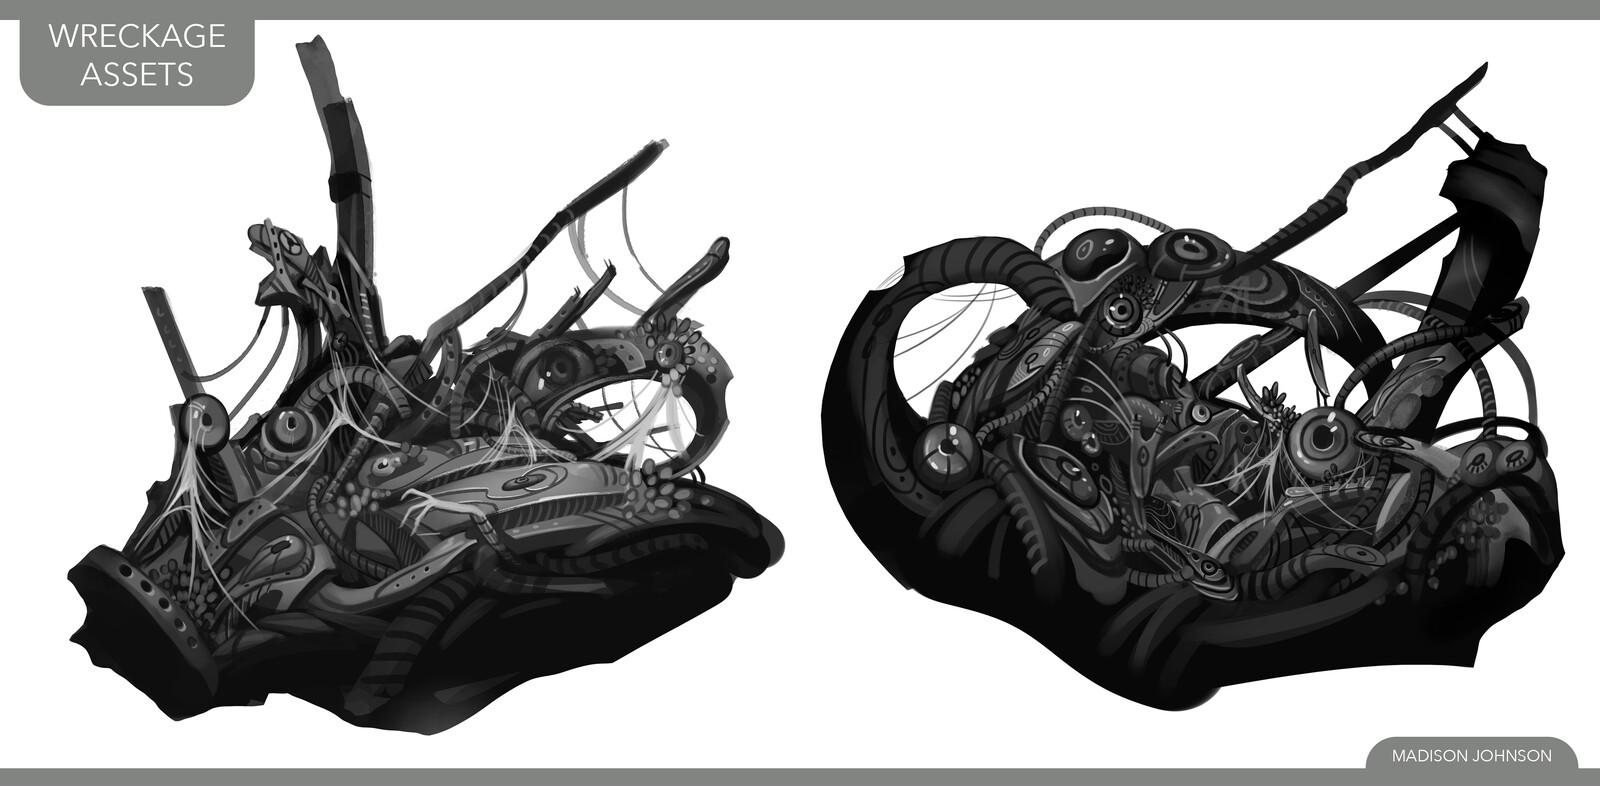 Wreckage Concepts